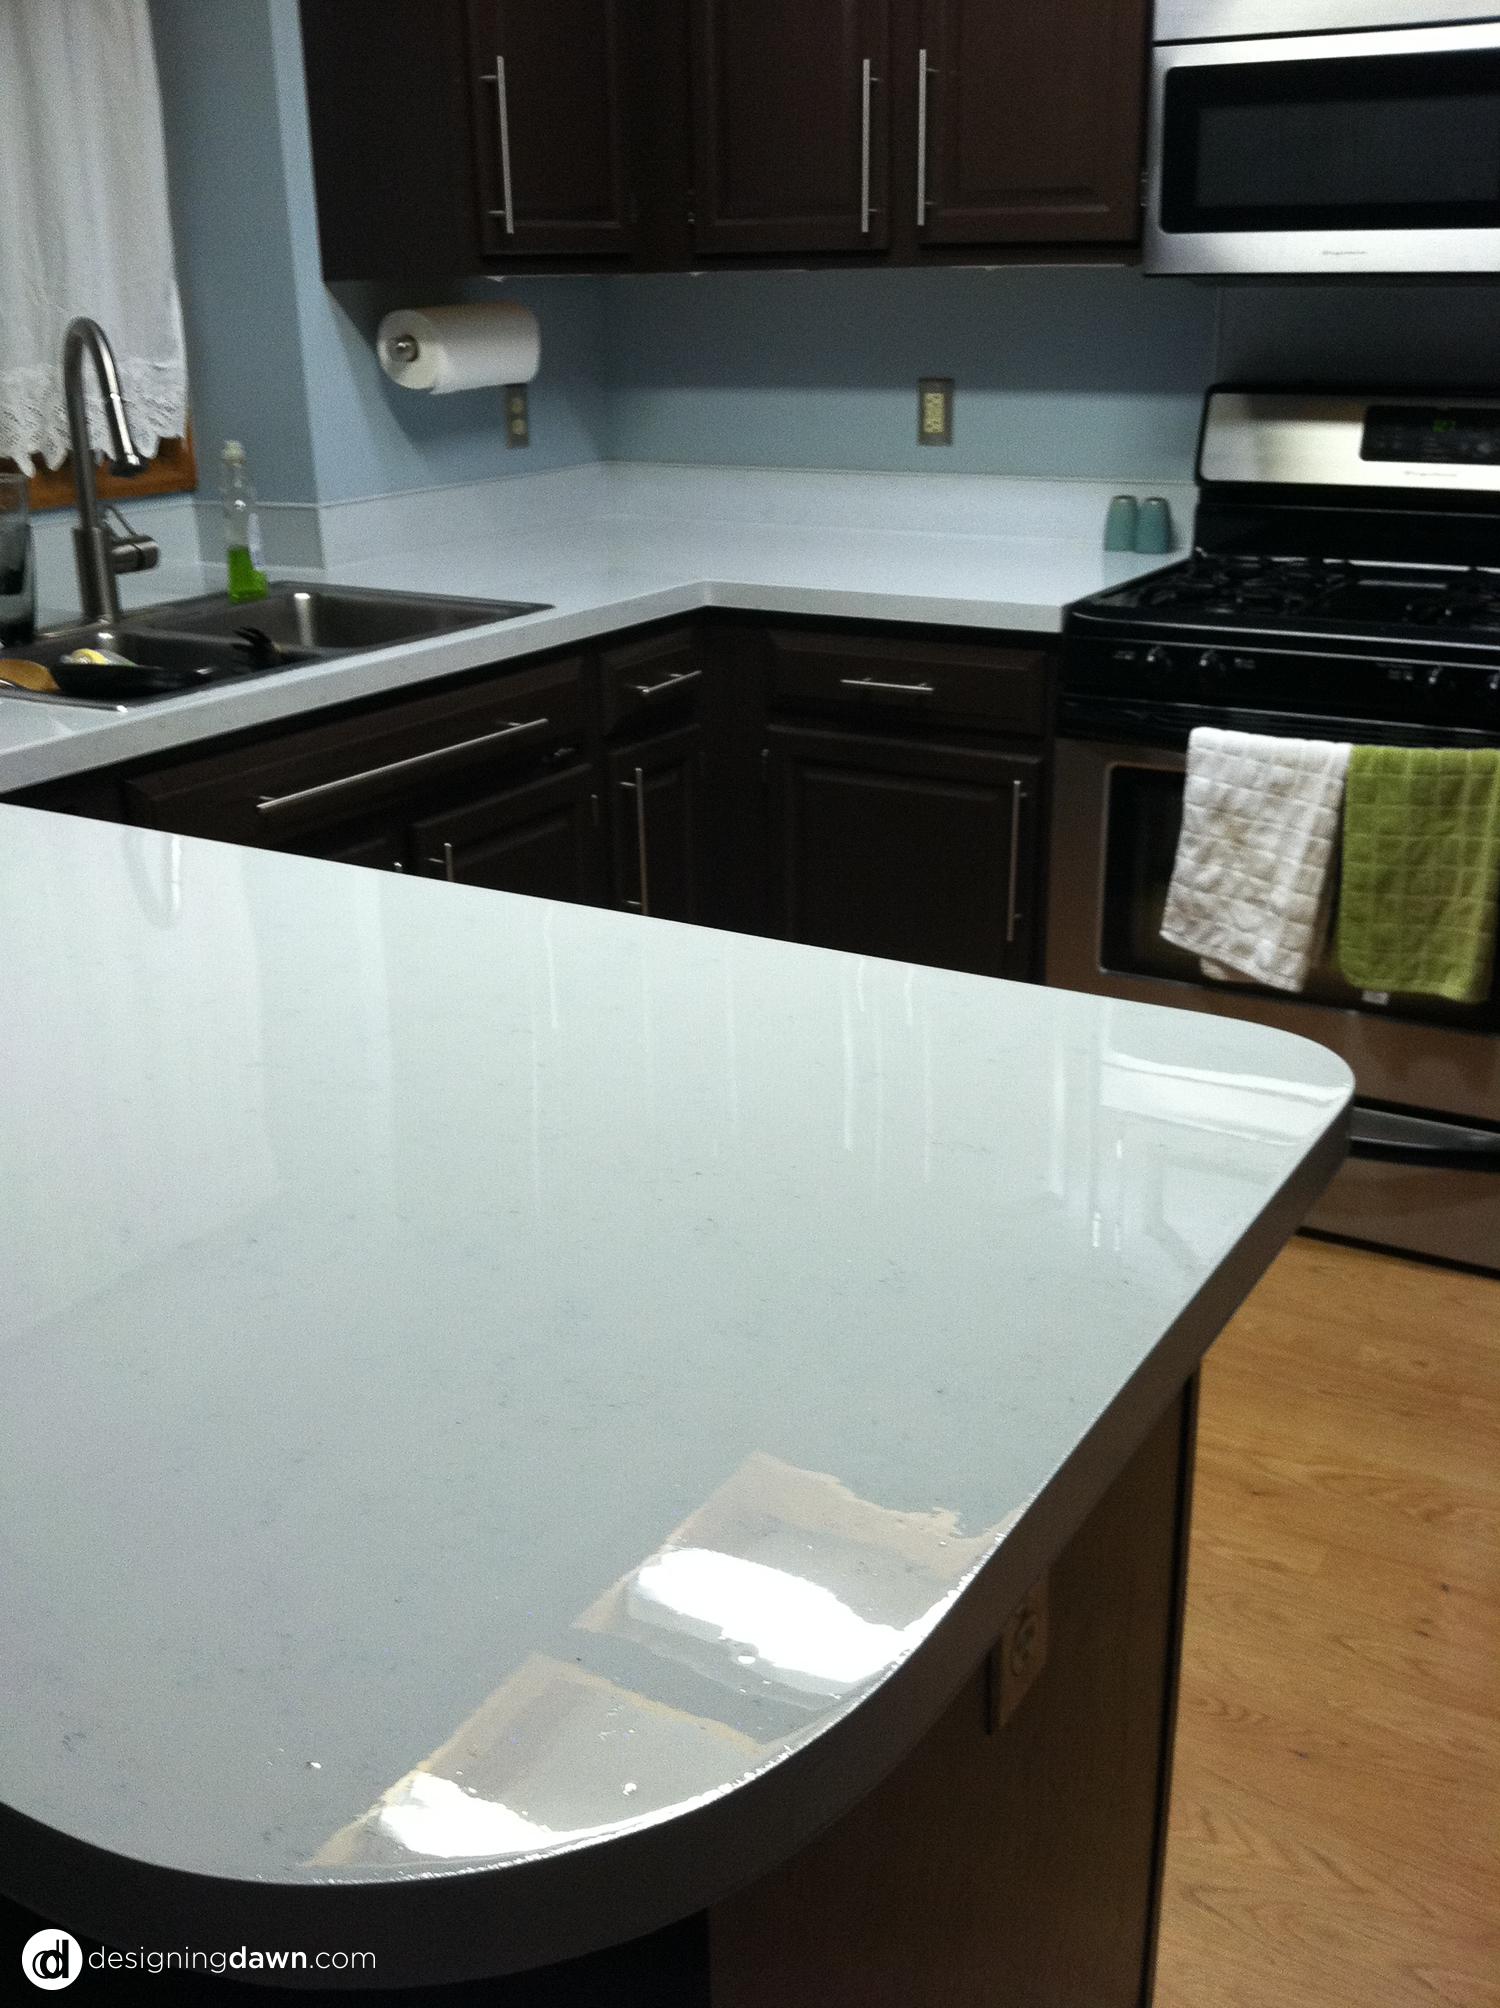 Kitchen Counters - Designing Dawn -3